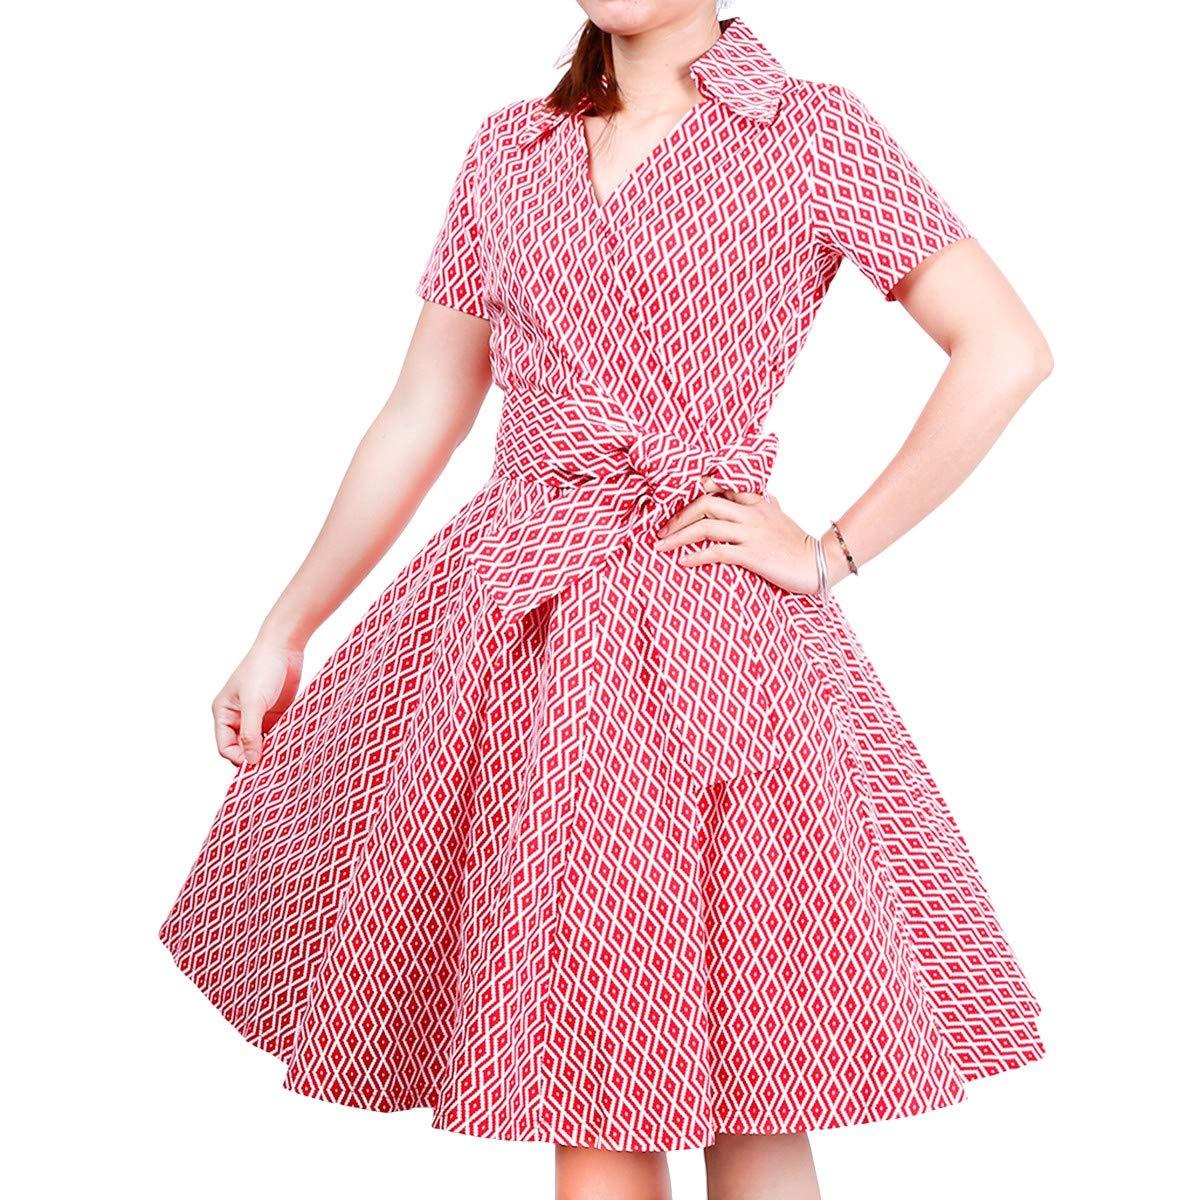 Samtree Womens Polka Dot Dresses,50s Style Short Sleeves Rockabilly Vintage Dress